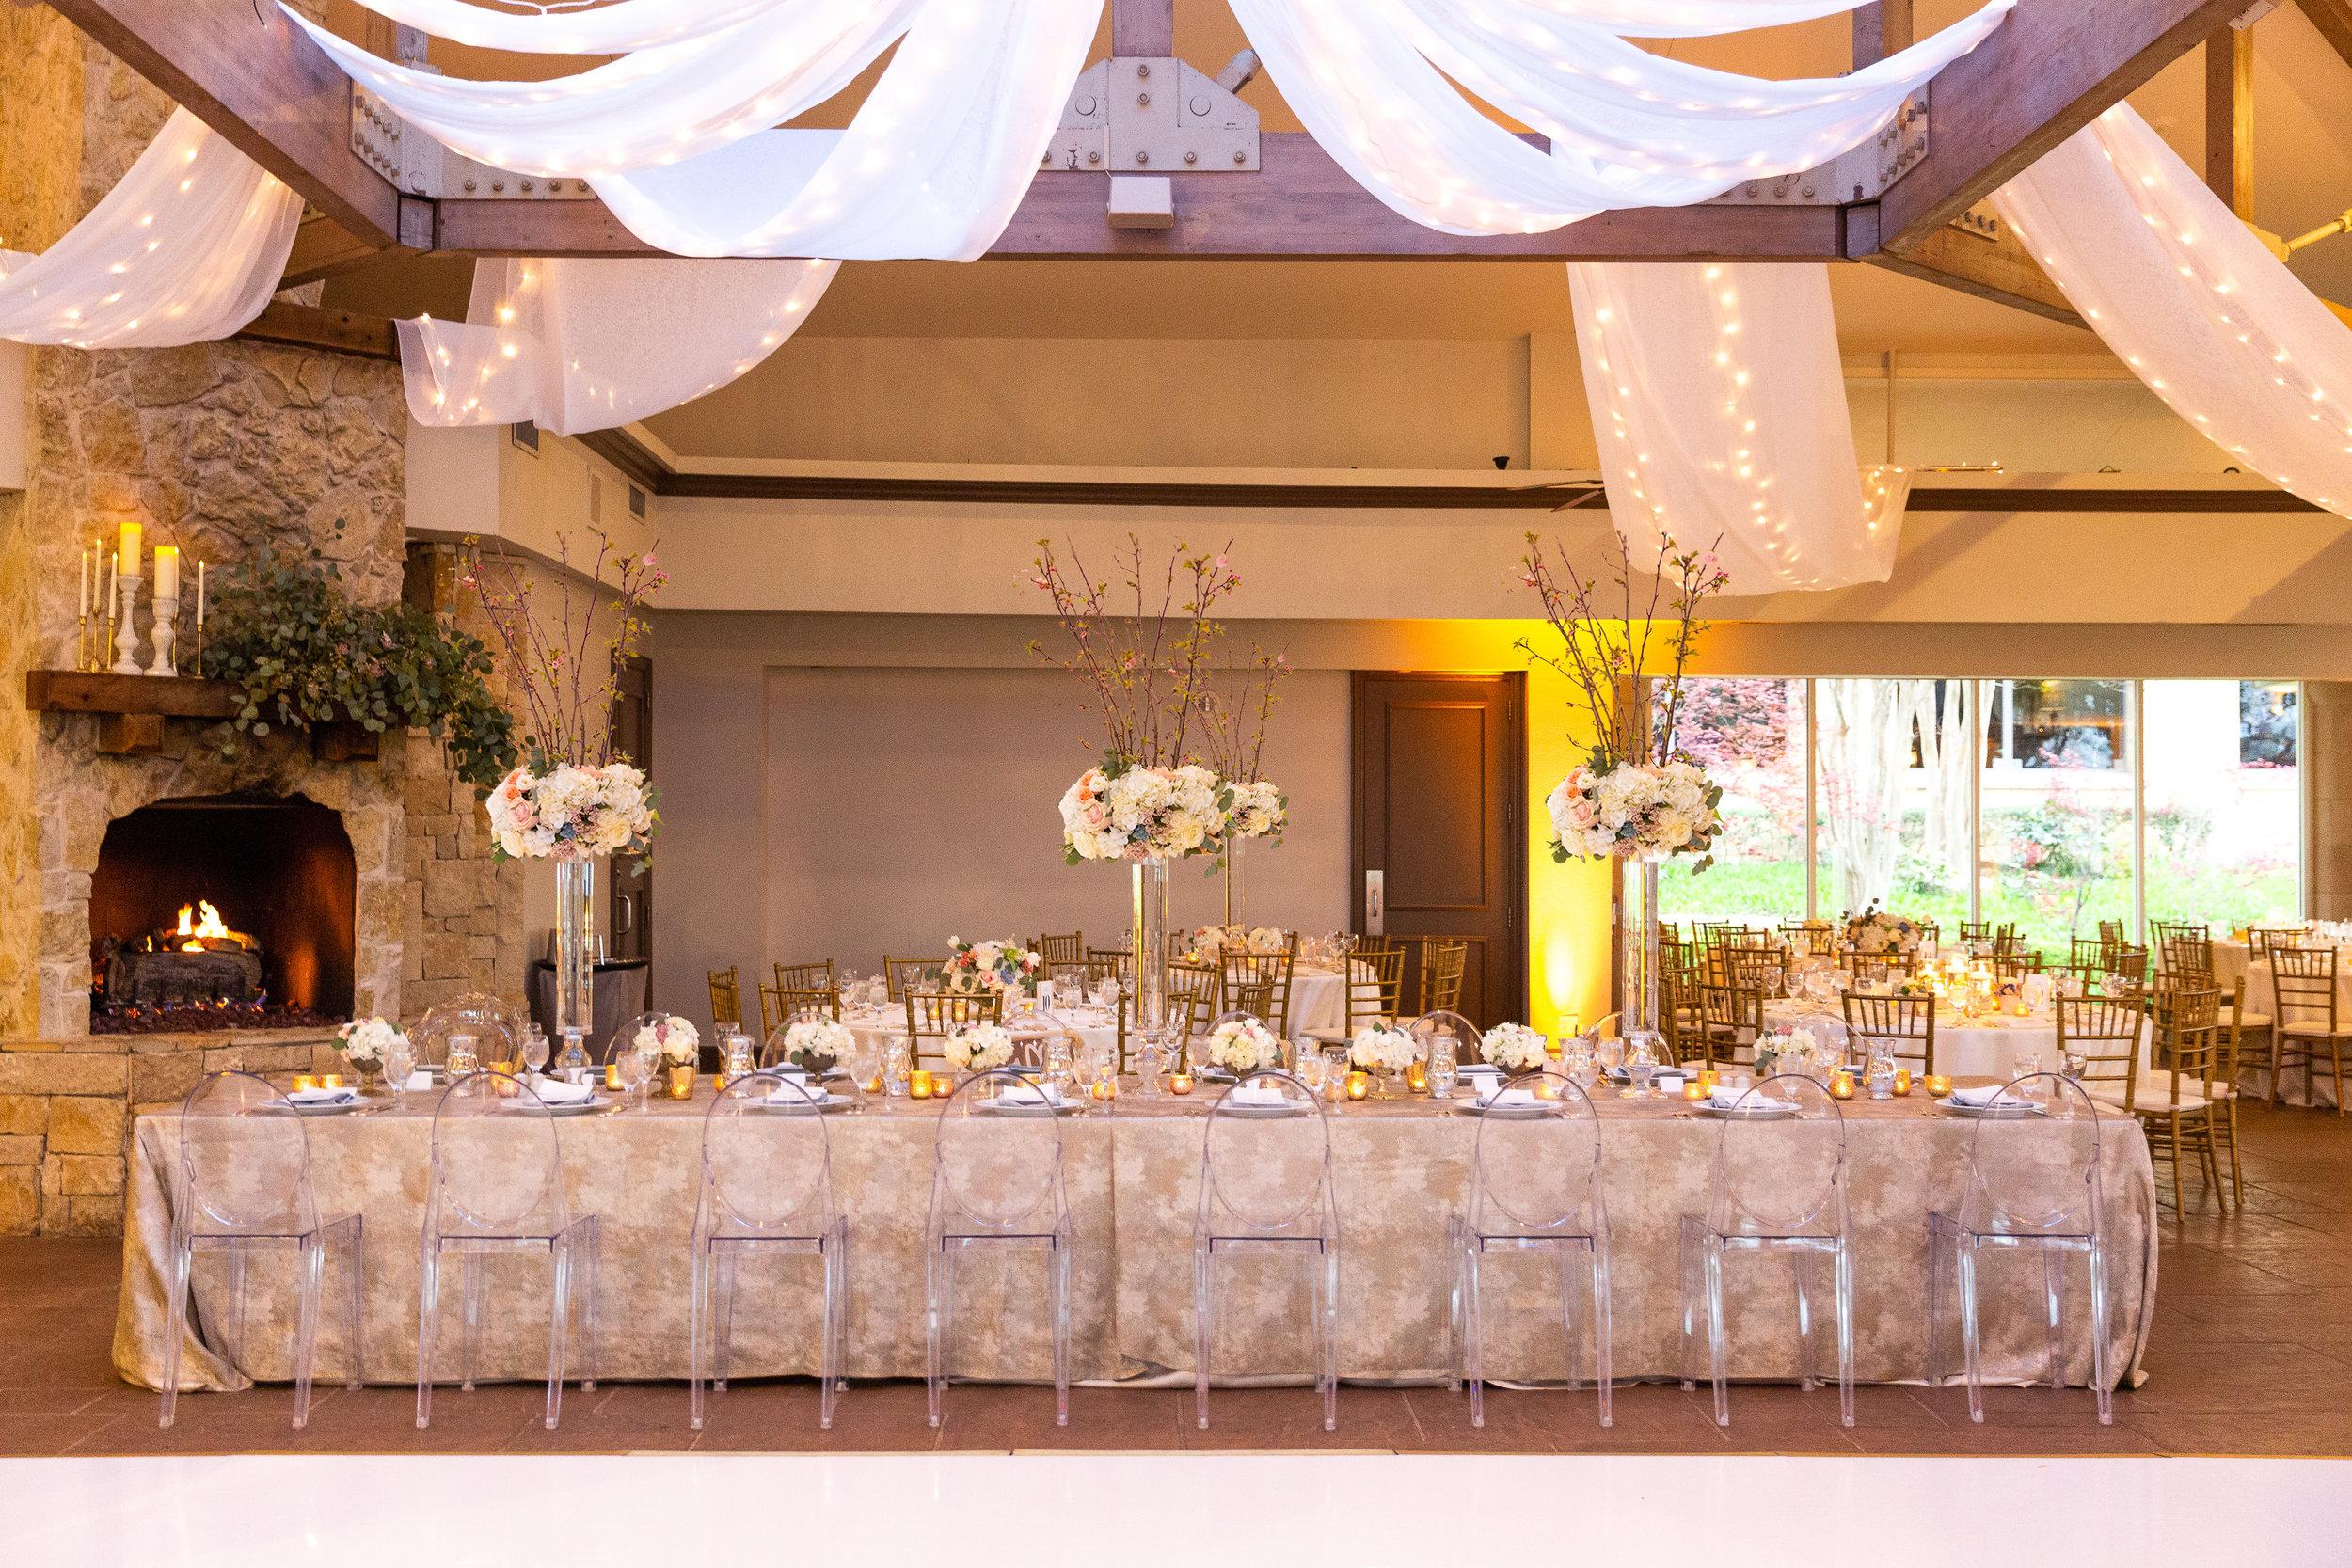 DFW Wedding Planner - Caroline + Jeff at The Four Seasons Hotel Wedding - Allday Events - 219.jpg